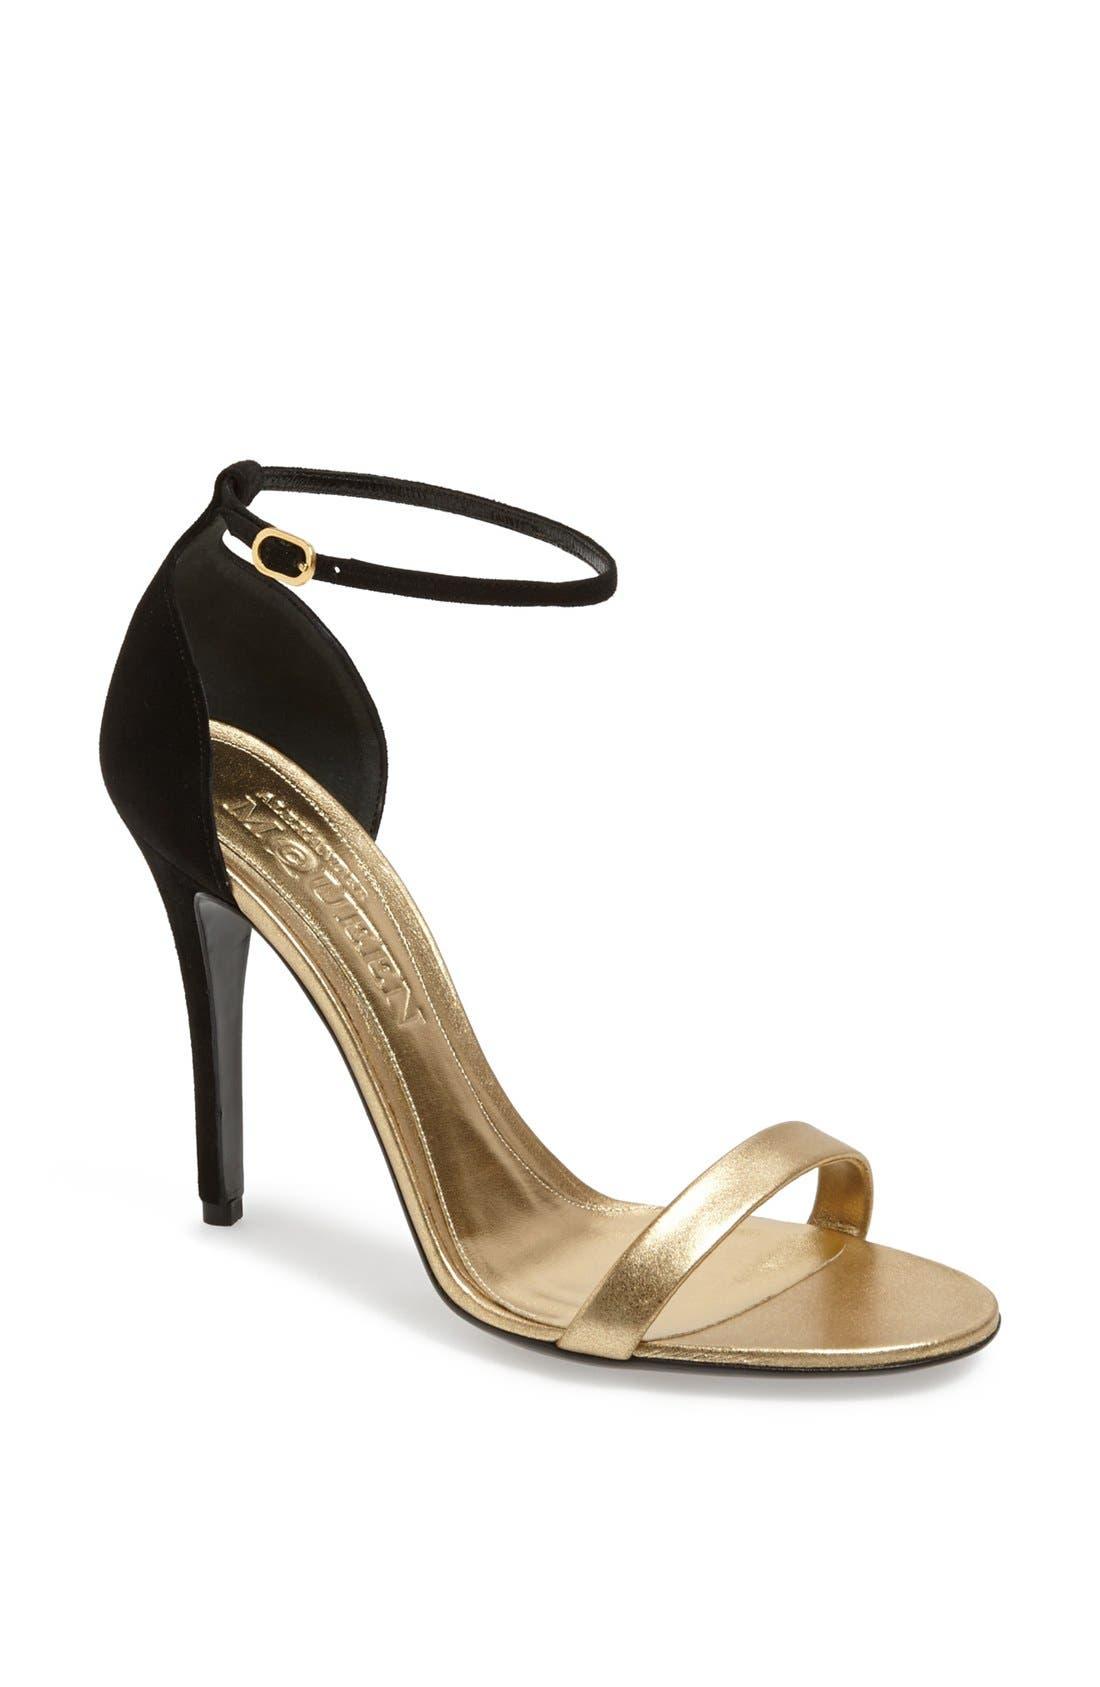 Main Image - Alexander McQueen 'Minimalist' Sandal